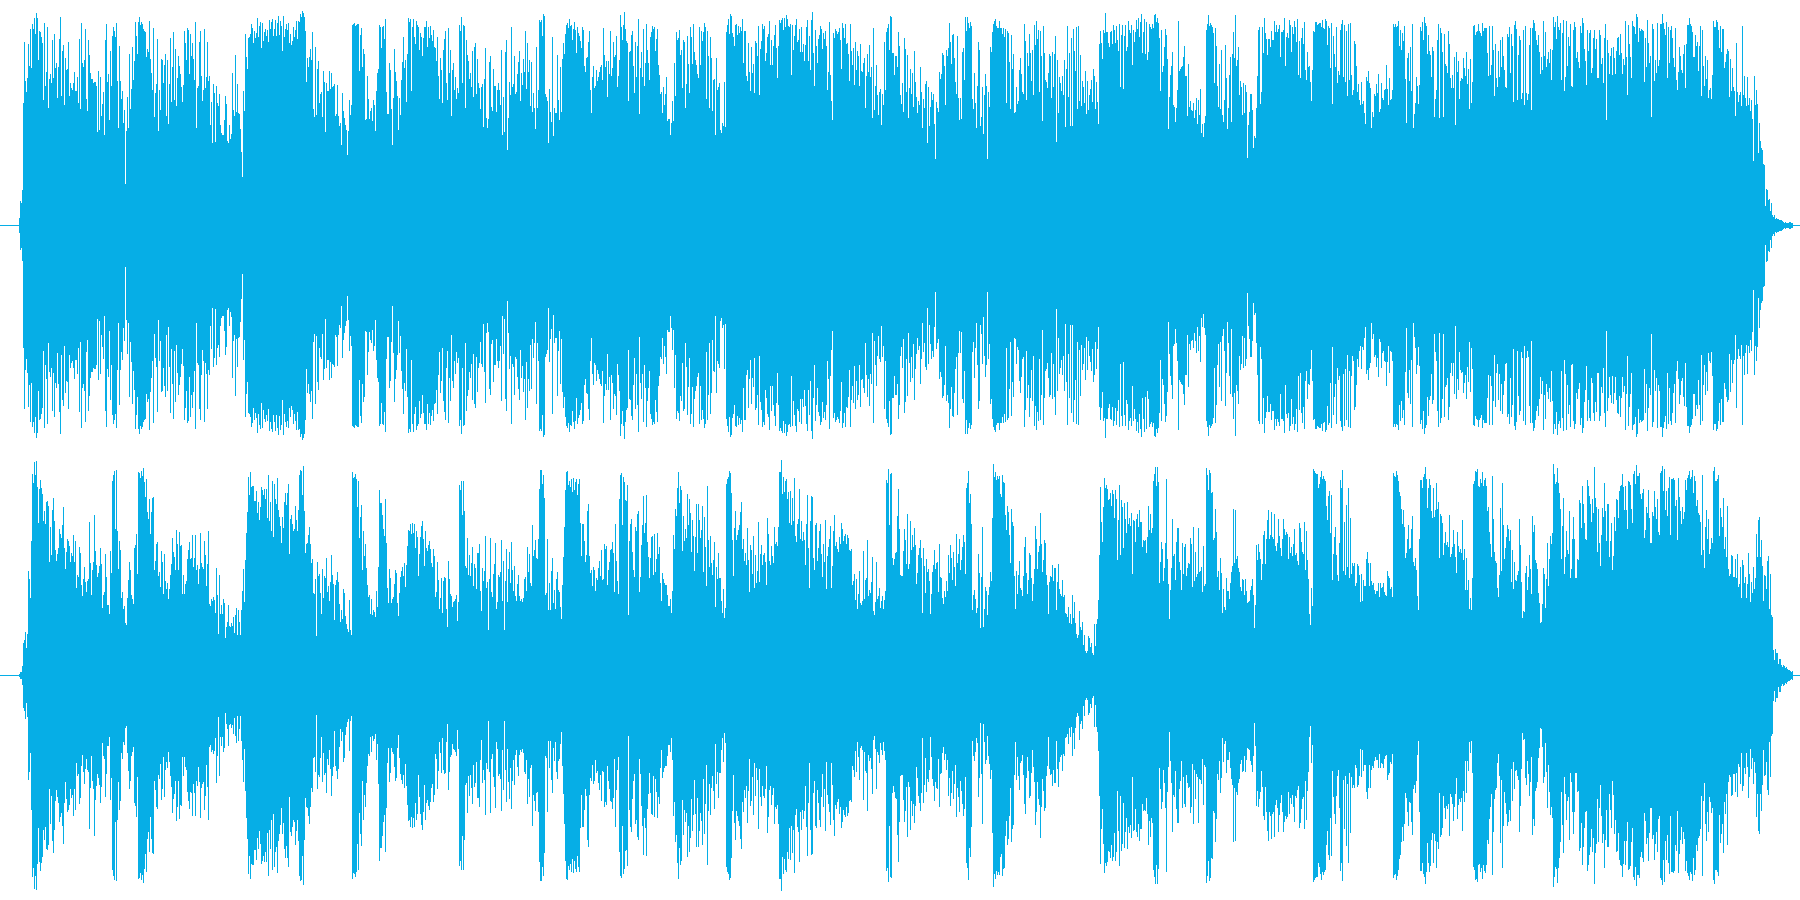 Hard Rockのリフと決めフレーズの再生済みの波形